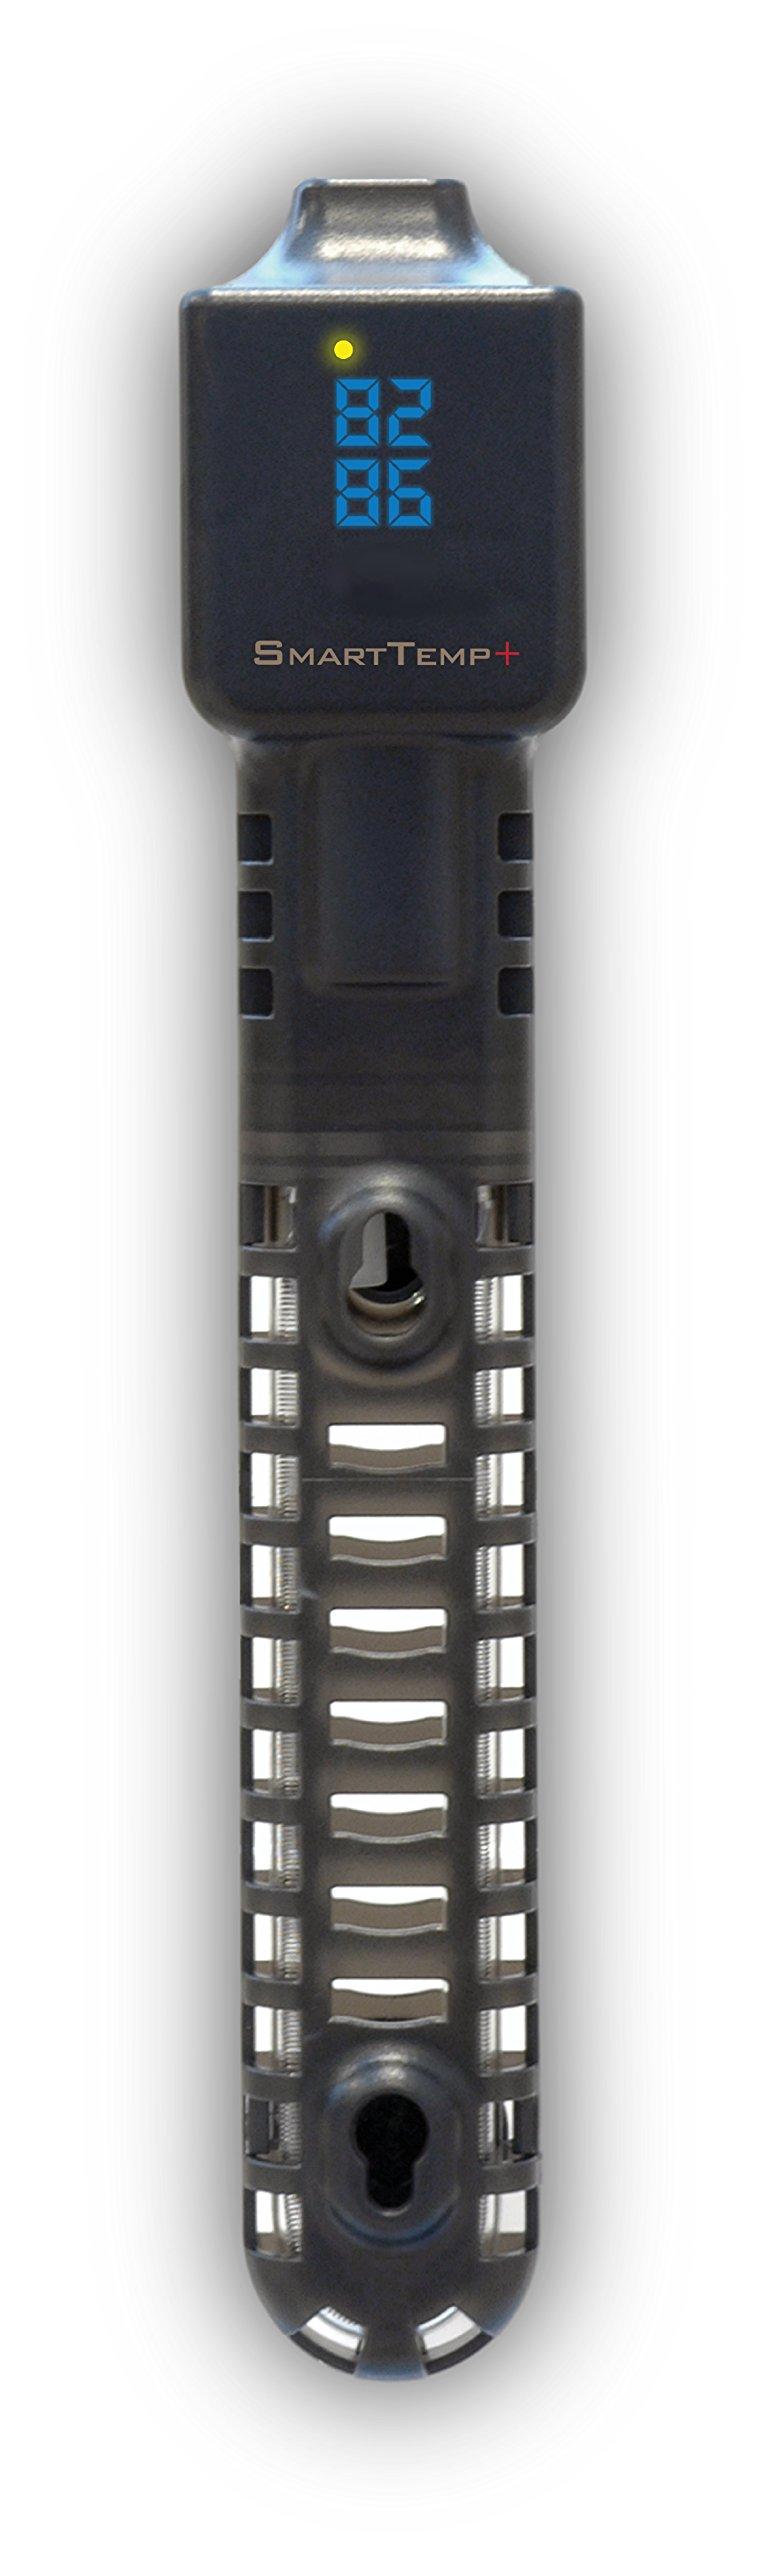 Encompass All Advanced 200W Digital Aquarium Heater w/Built-in Thermometer & Wireless Controller